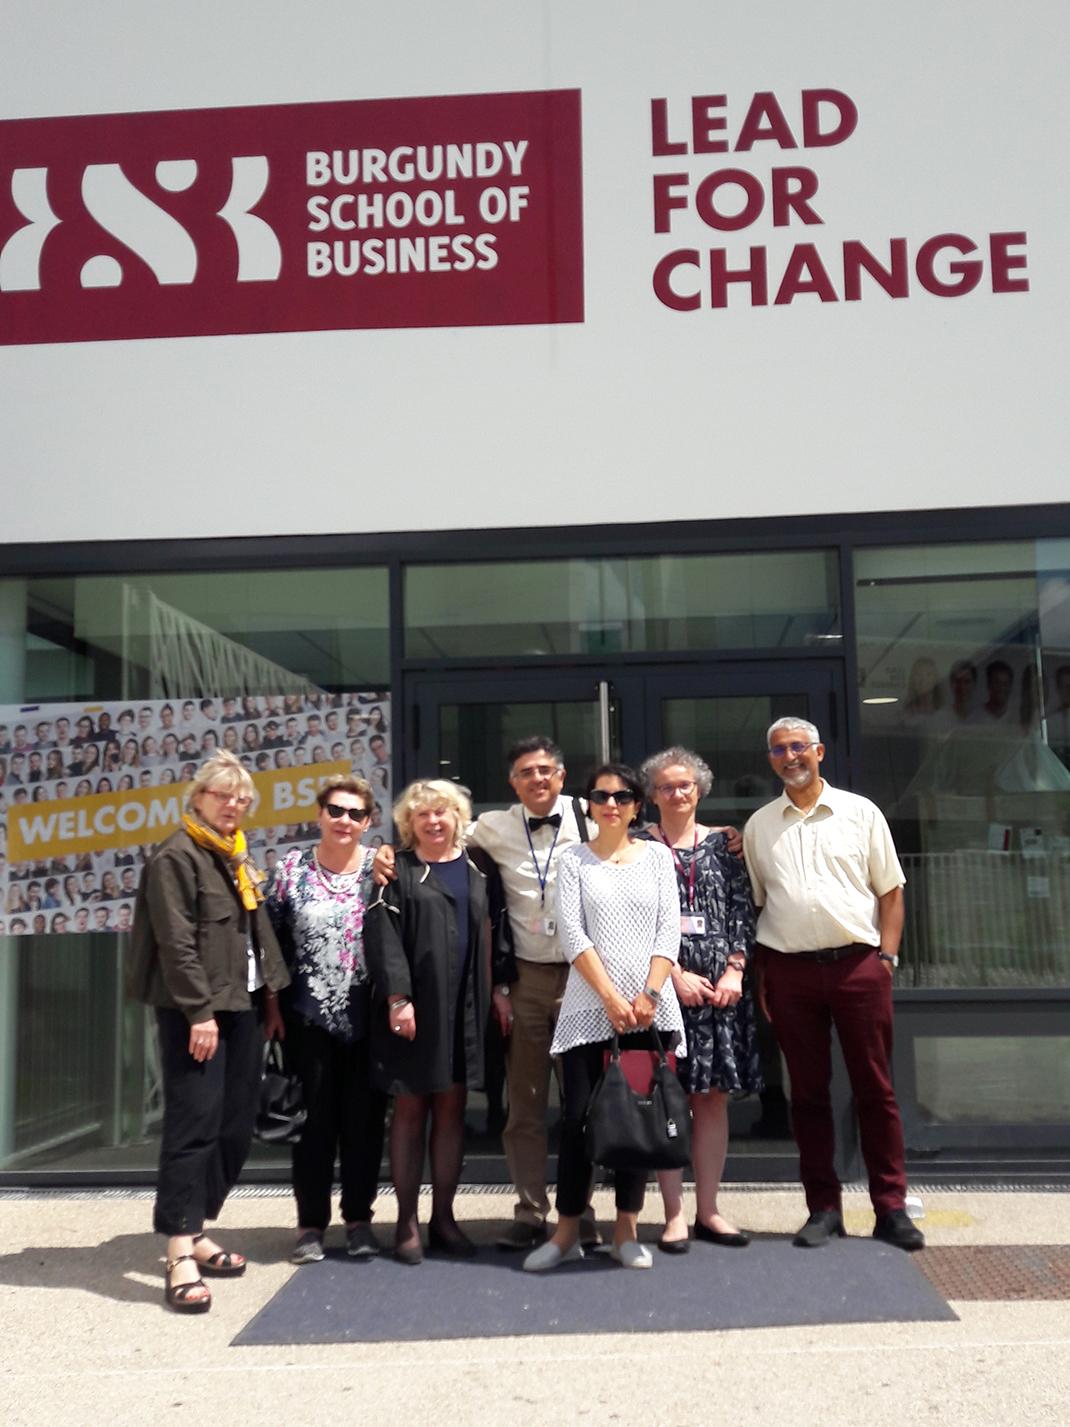 Академия развивает отношения с ведущими бизнес-школами Франции